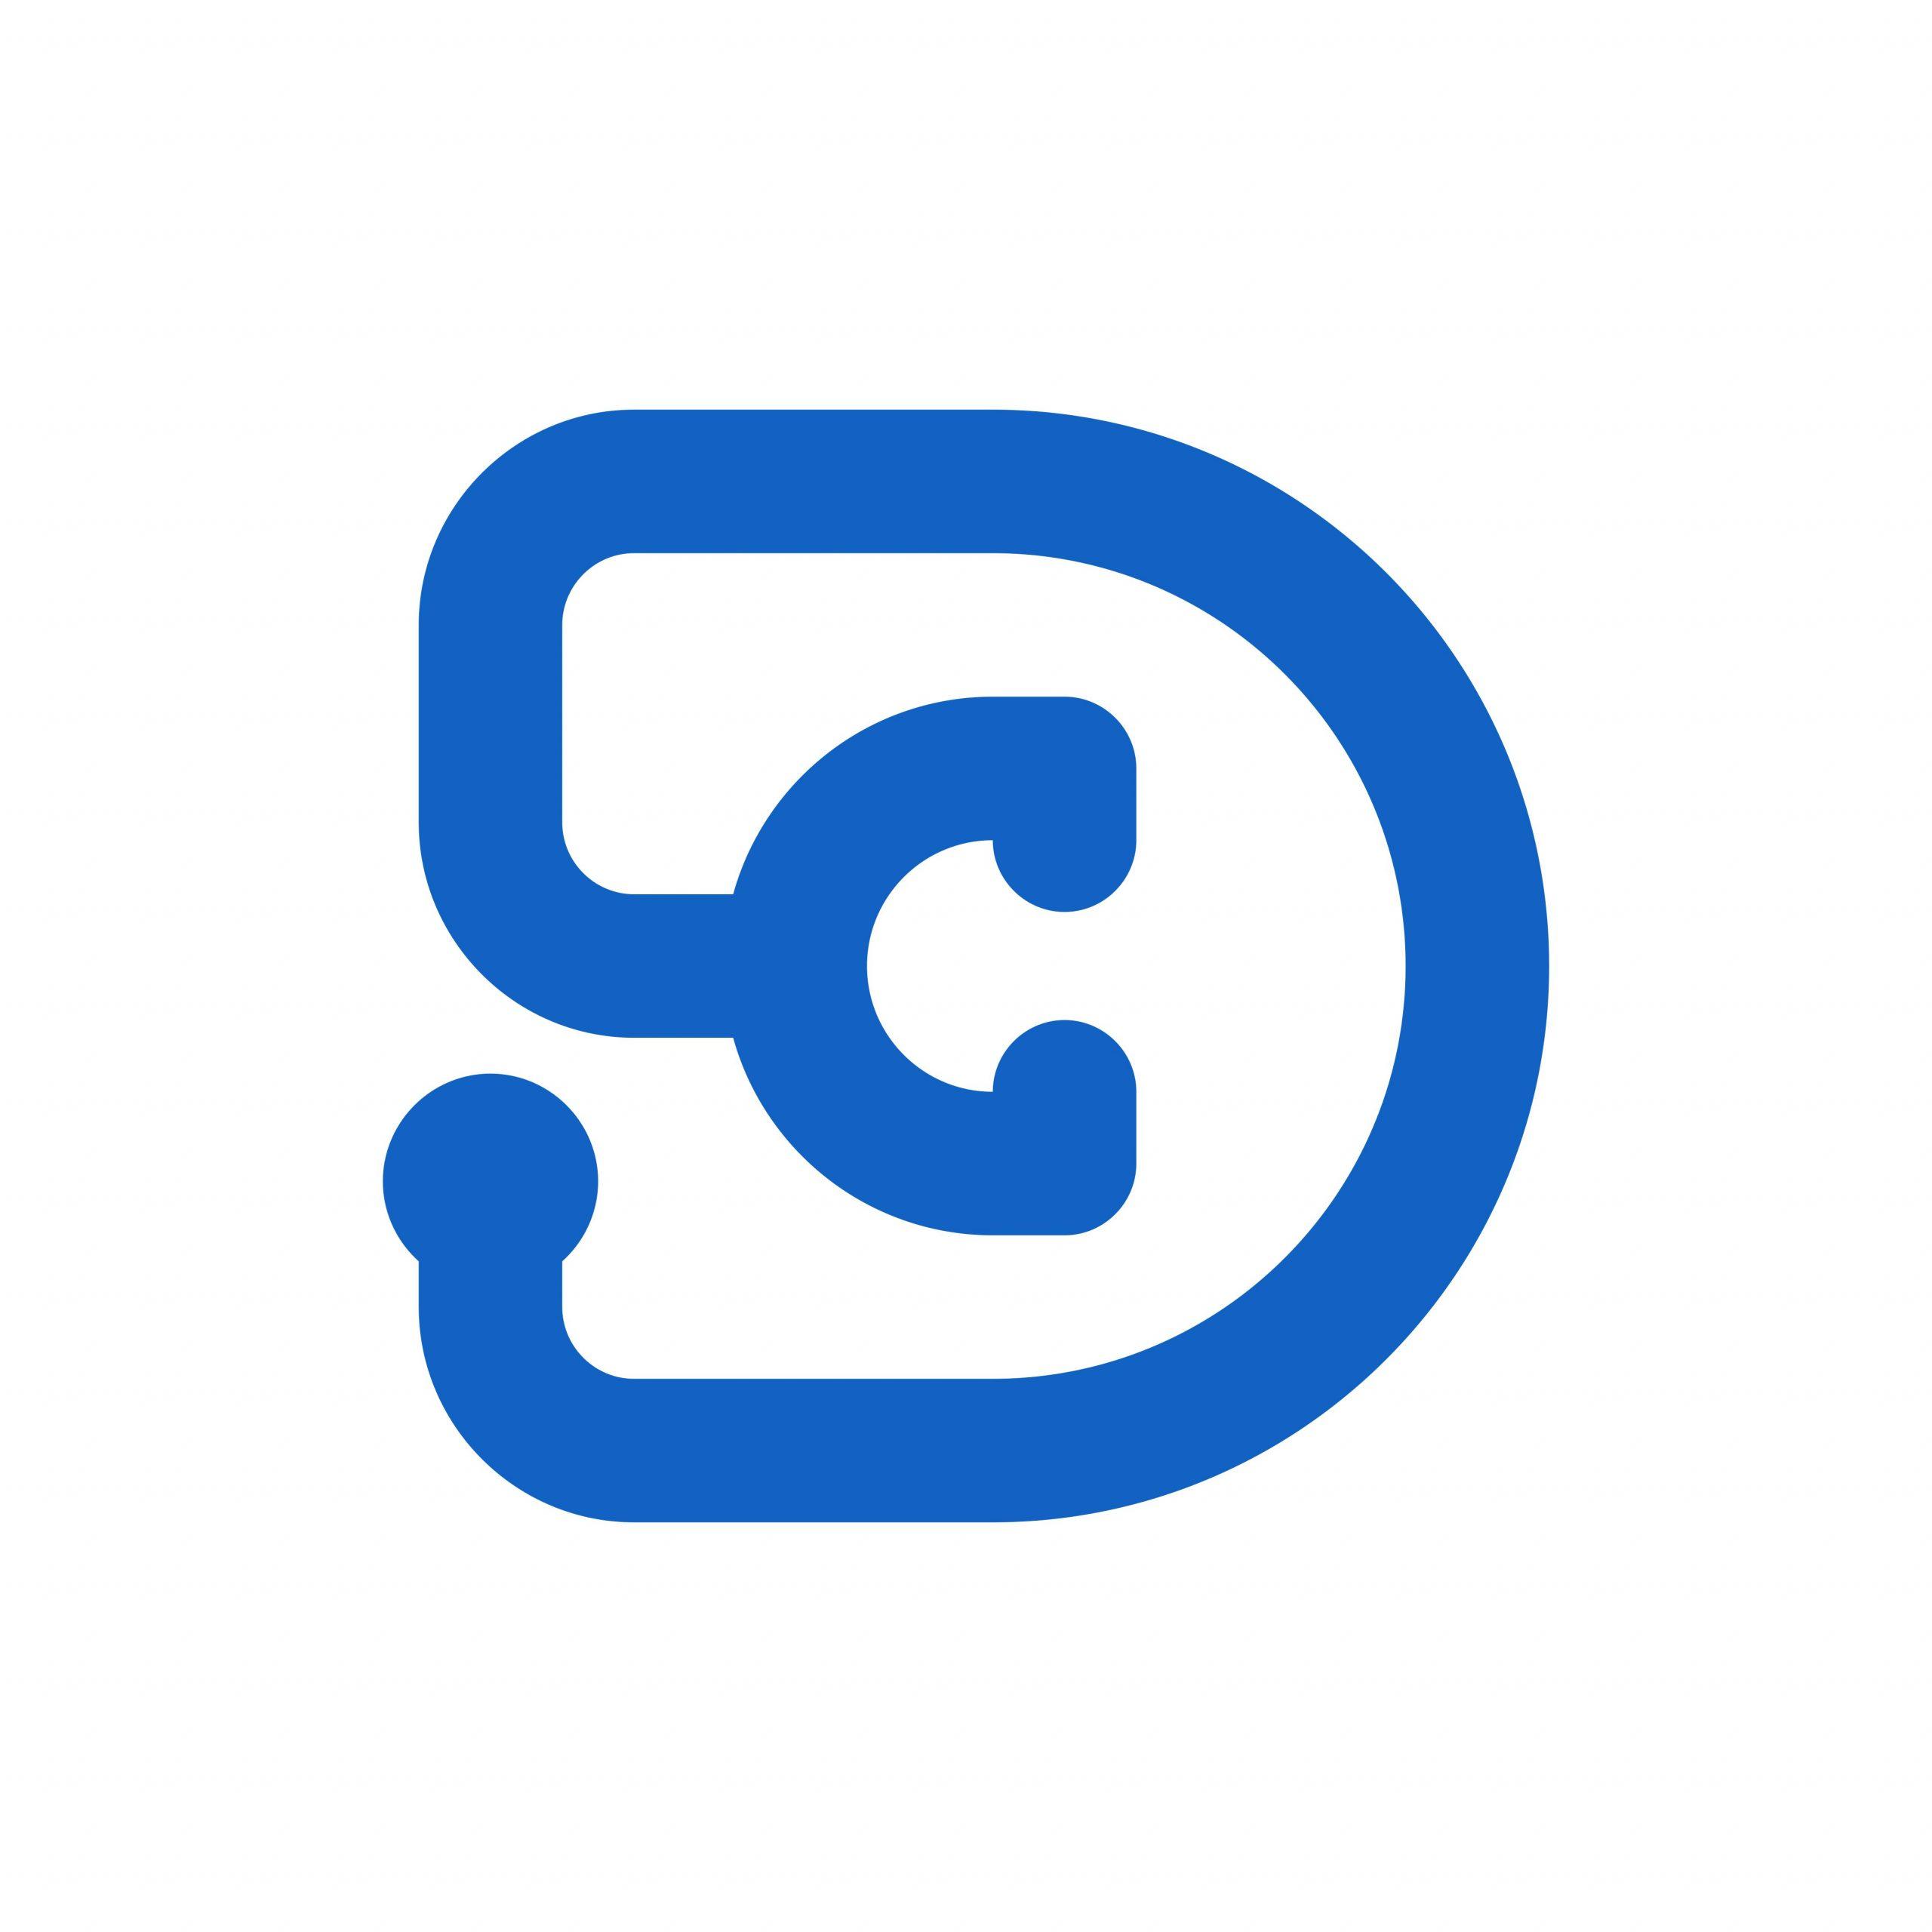 Doctor Dc Or Cd Logo